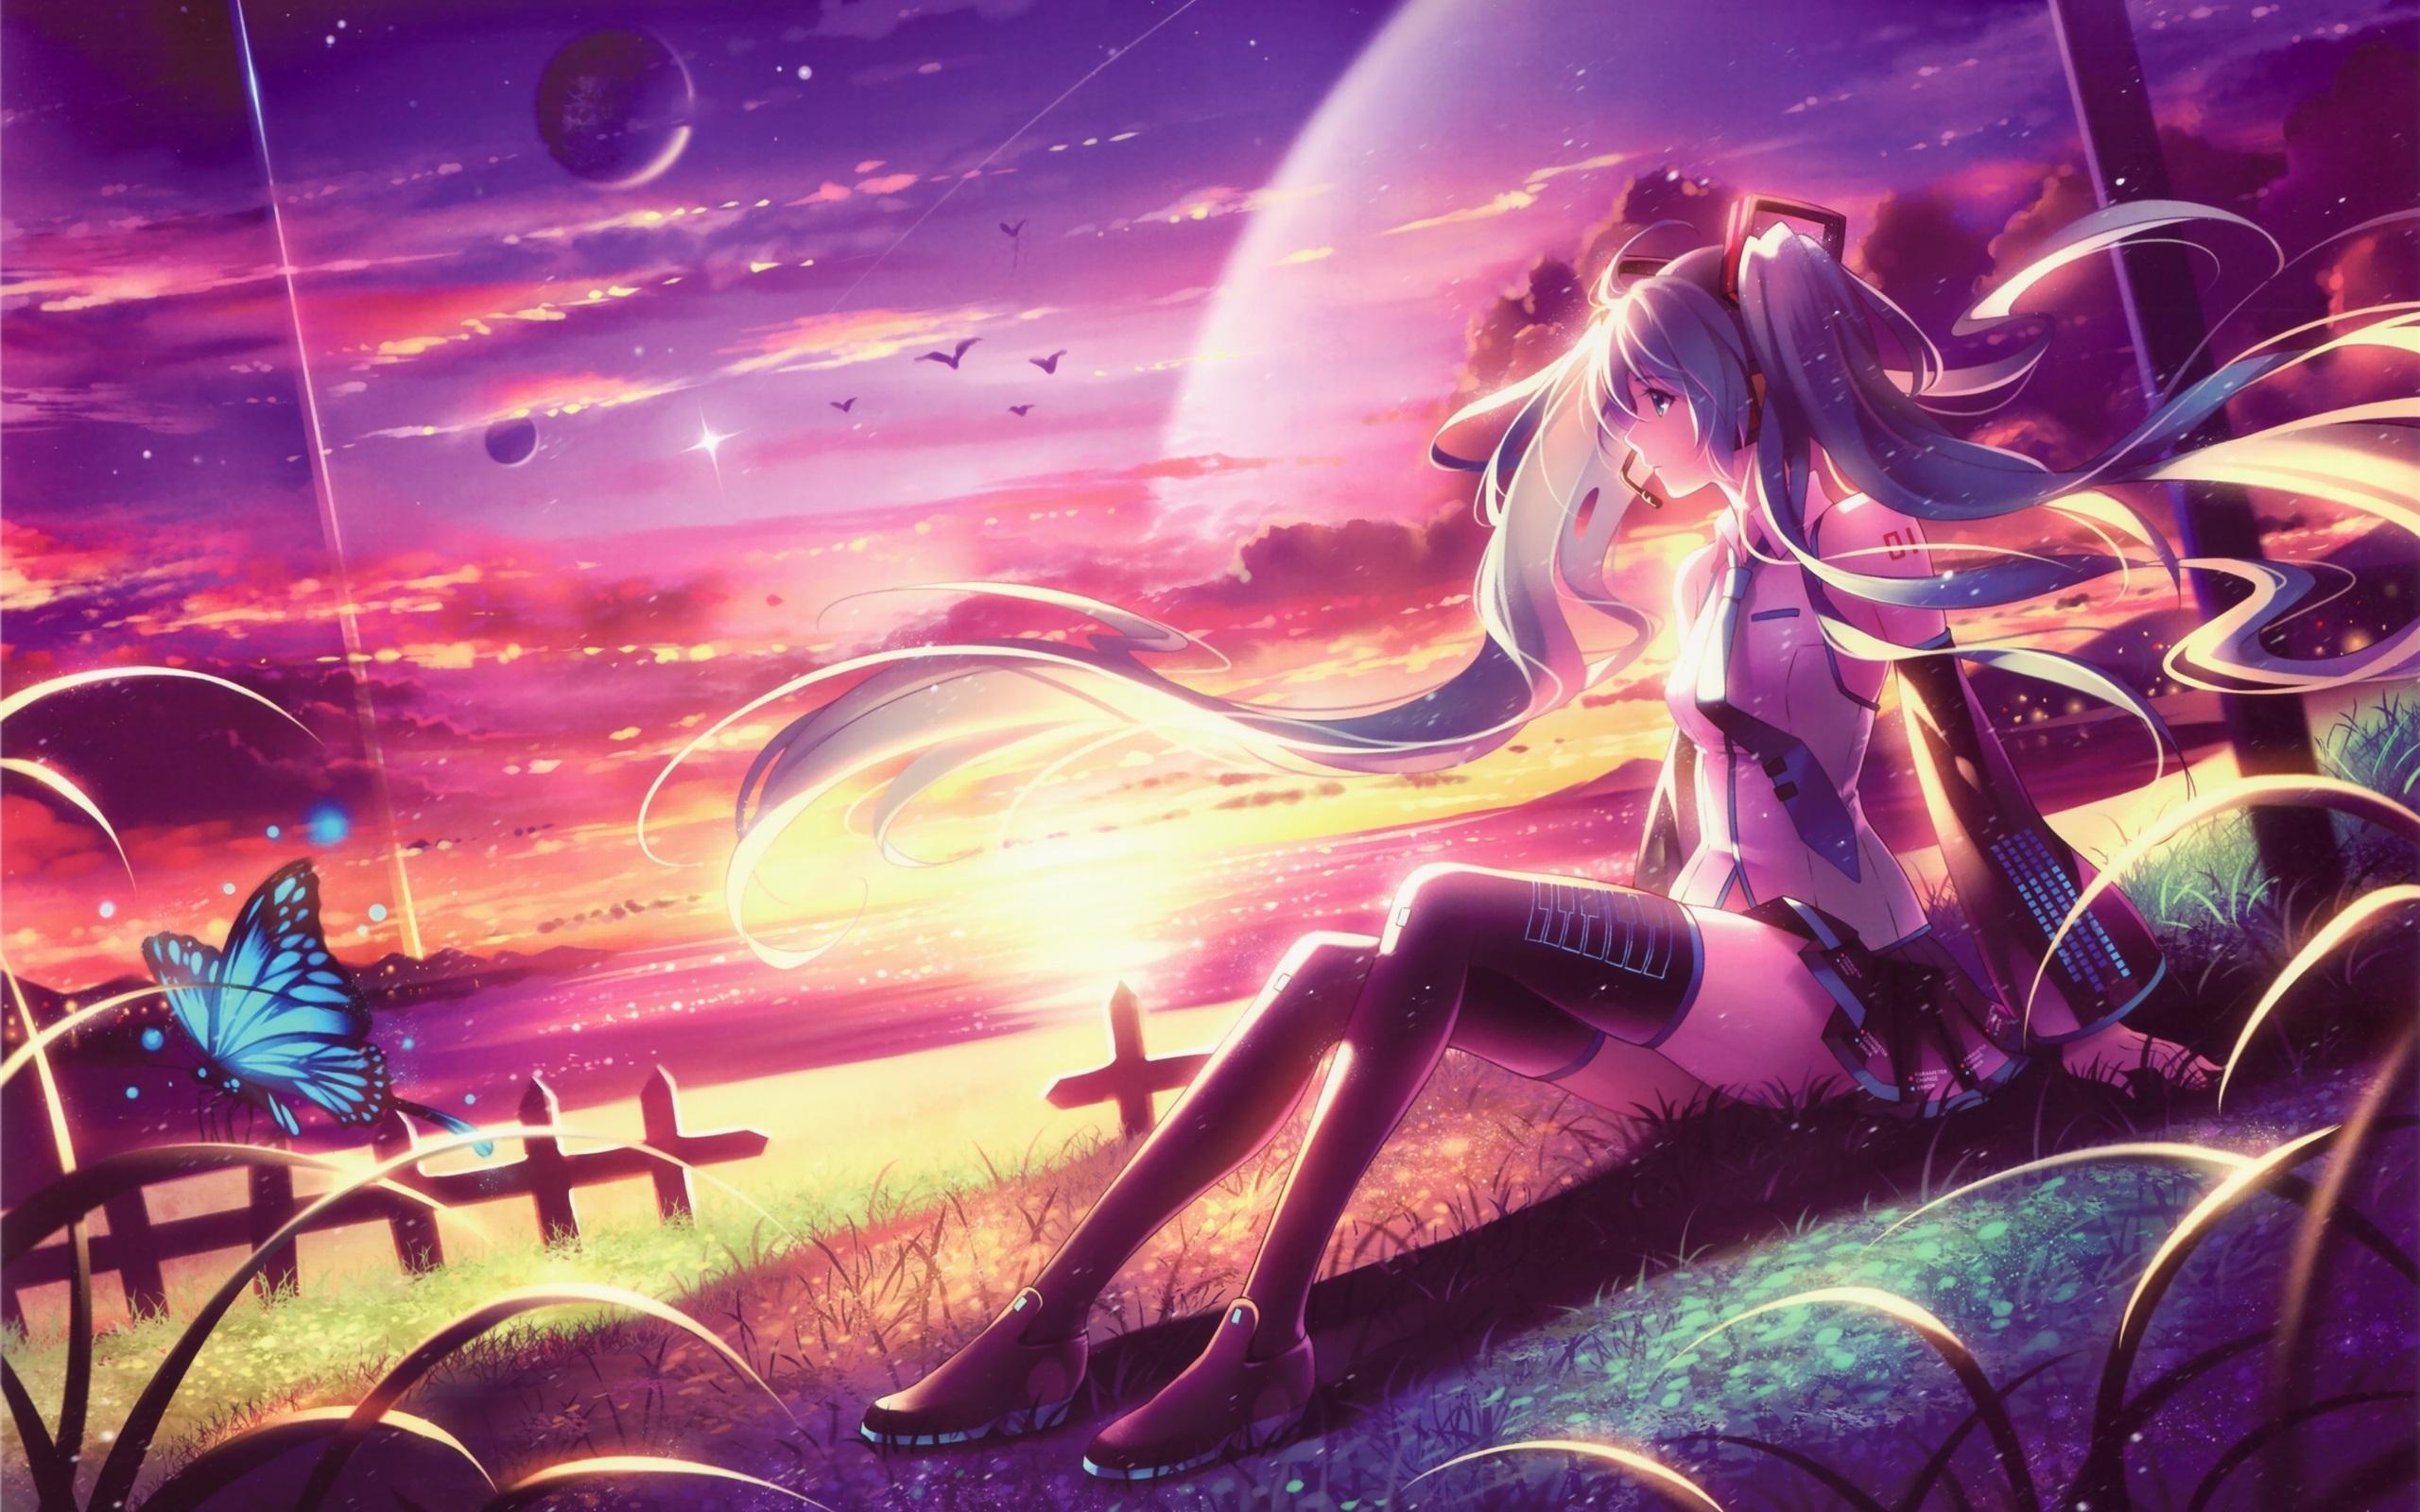 Wallpaper Hatsune Miku Long Hair Anime Girl Sitting At Beach